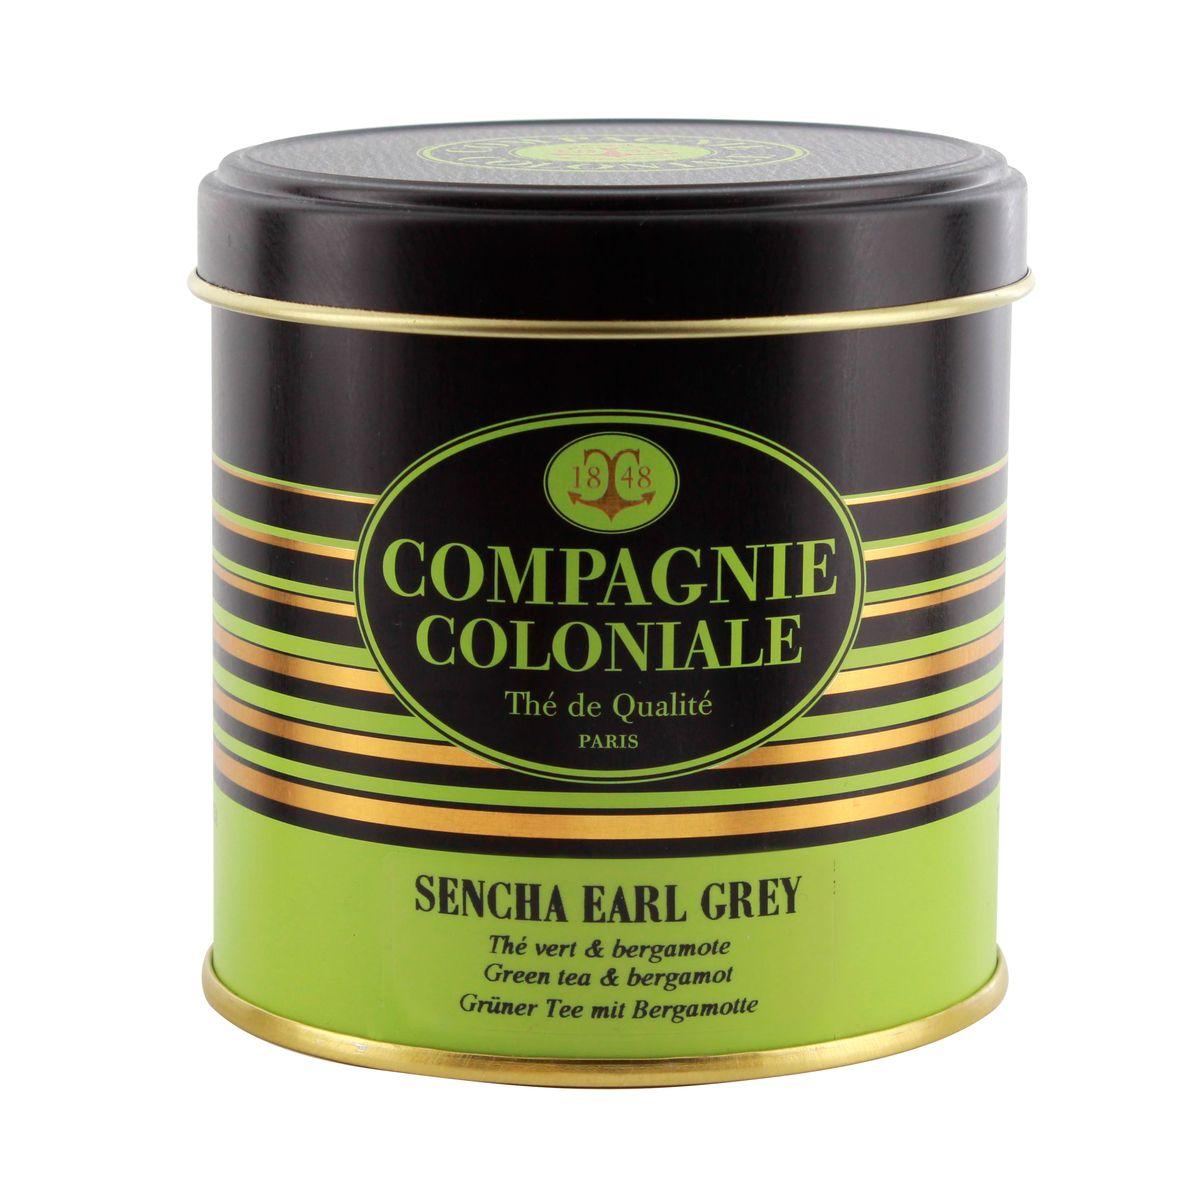 Thé vert aromatisé boîte métal Sencha Earl Grey - Compagnie Coloniale